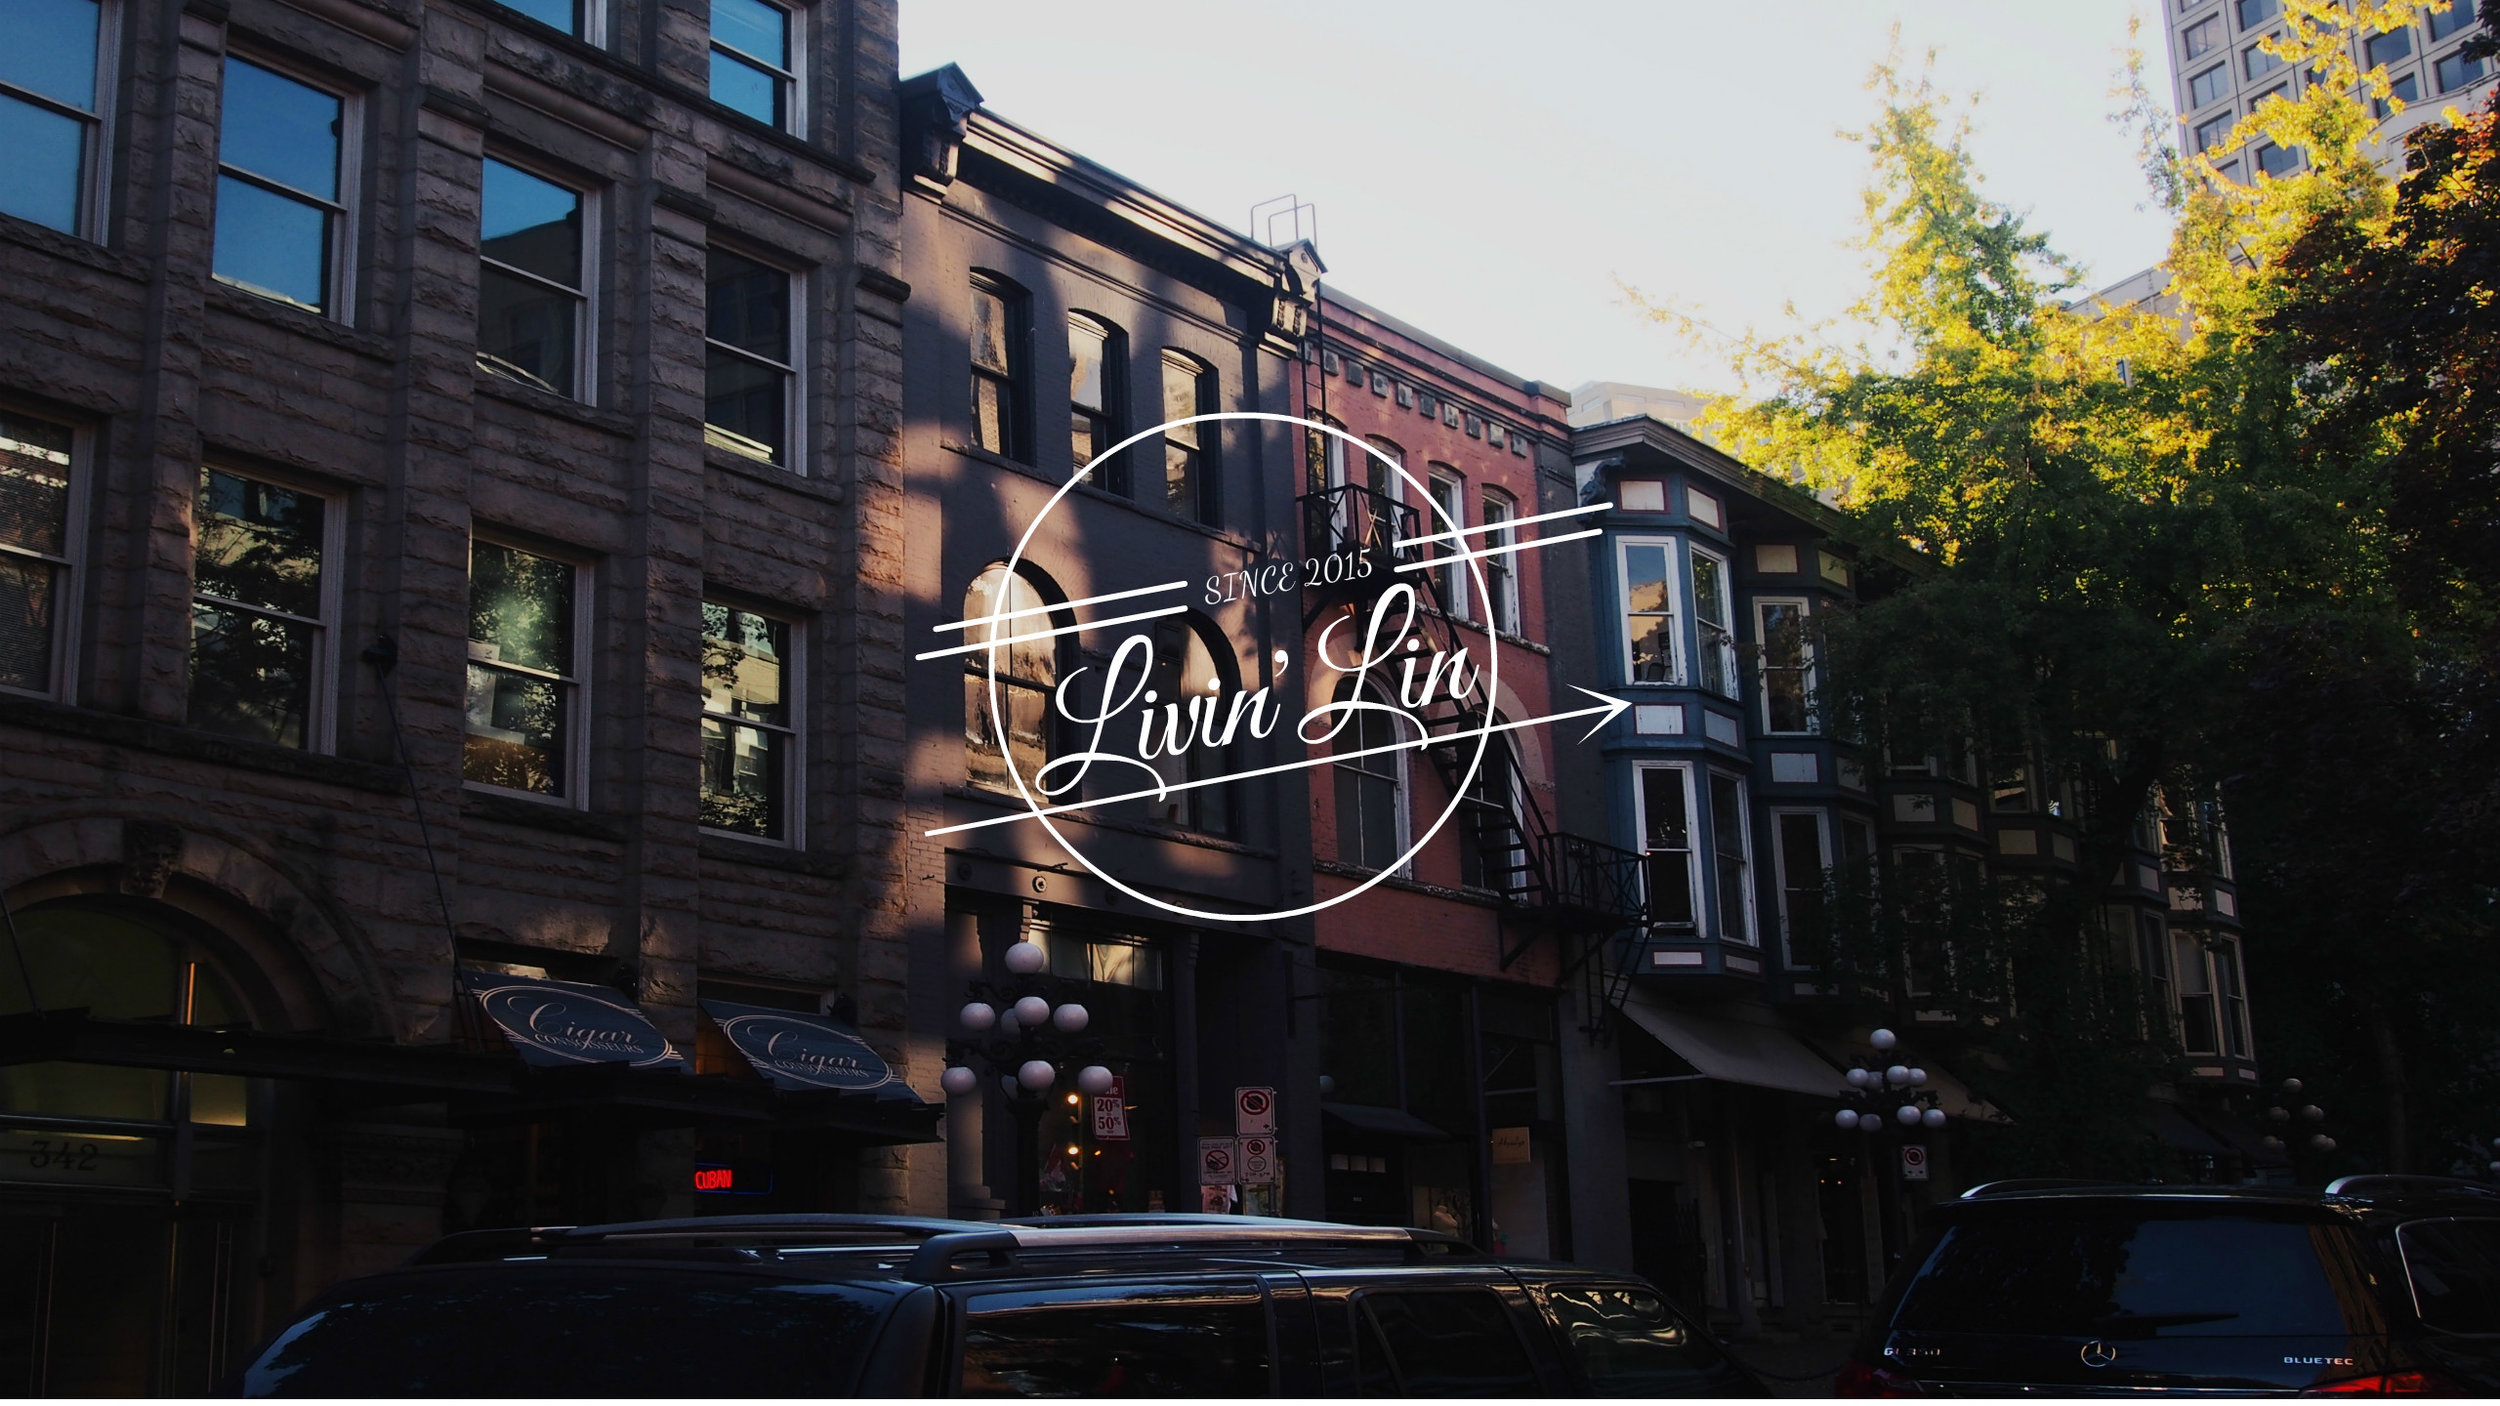 Blog Debut Graphic (2015) Photo: Lindsey Cruz Graphic: Created using 'Fotor' (Photo Editor & Design Maker)